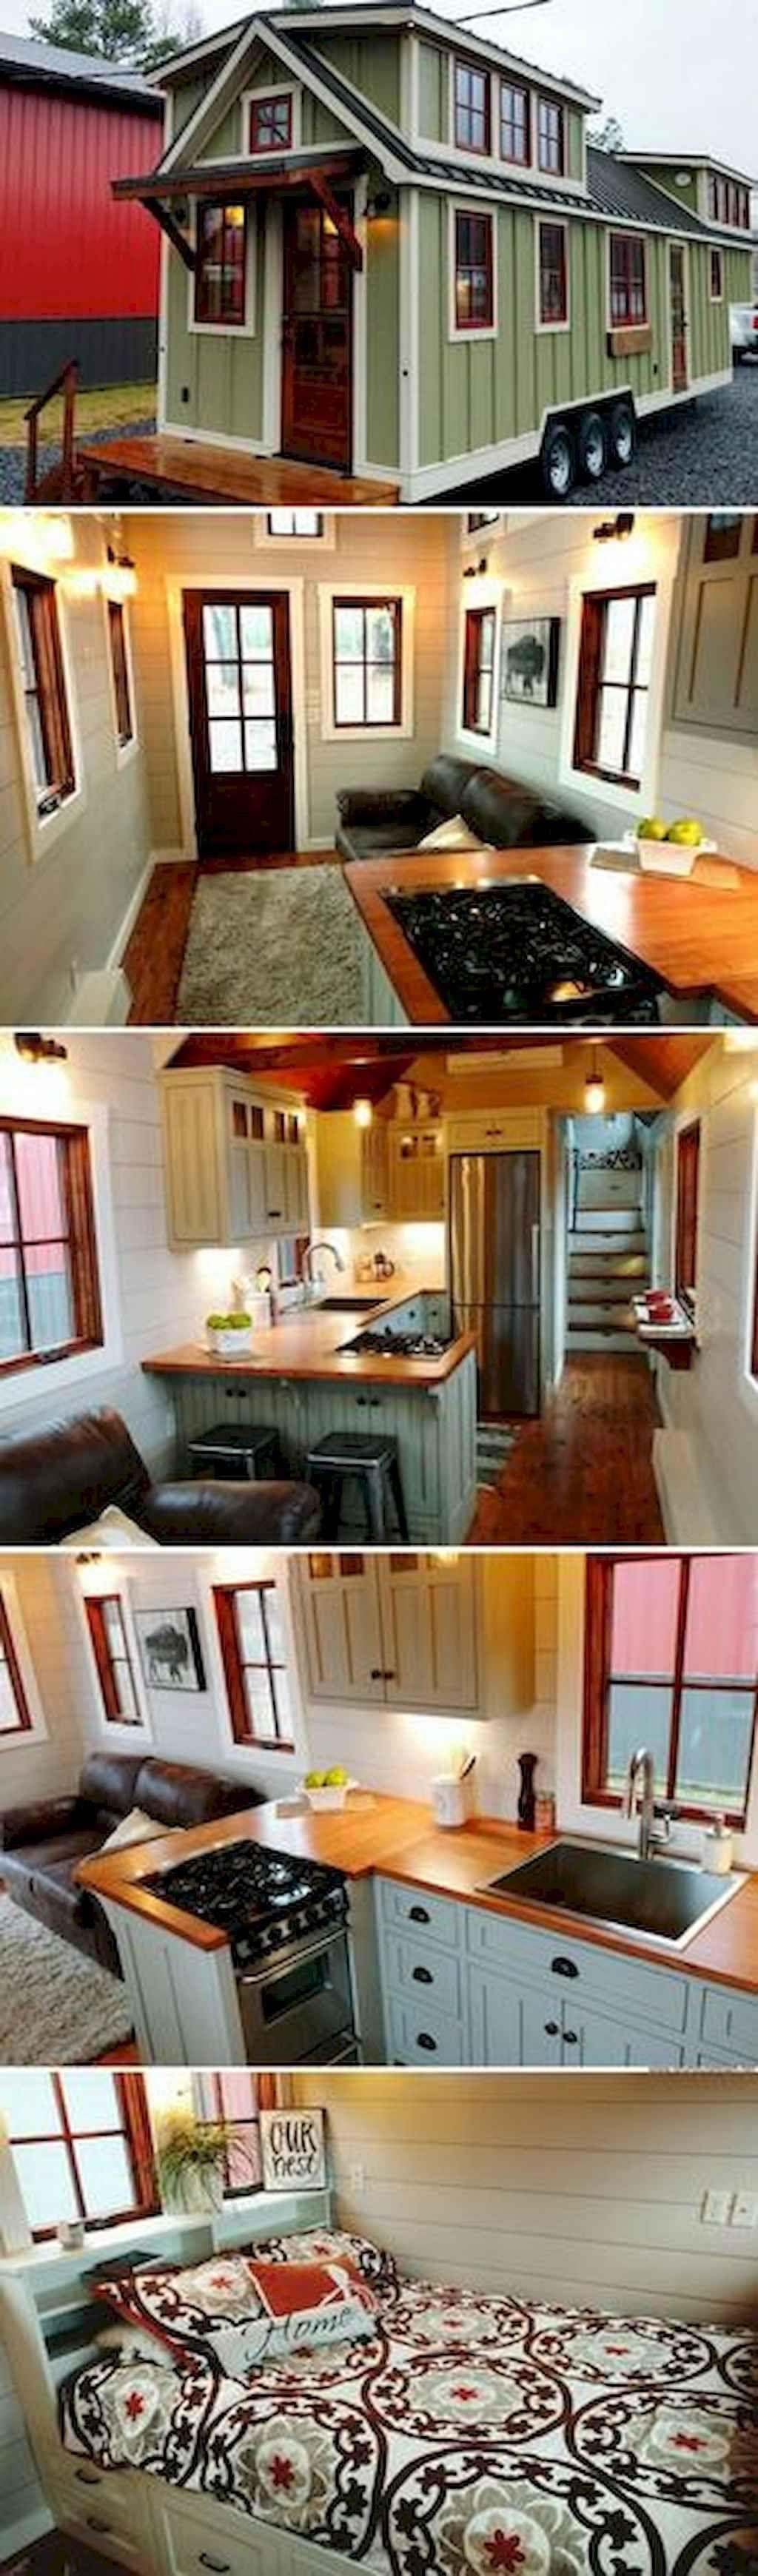 65 cute tiny house ideas & organization tips (1